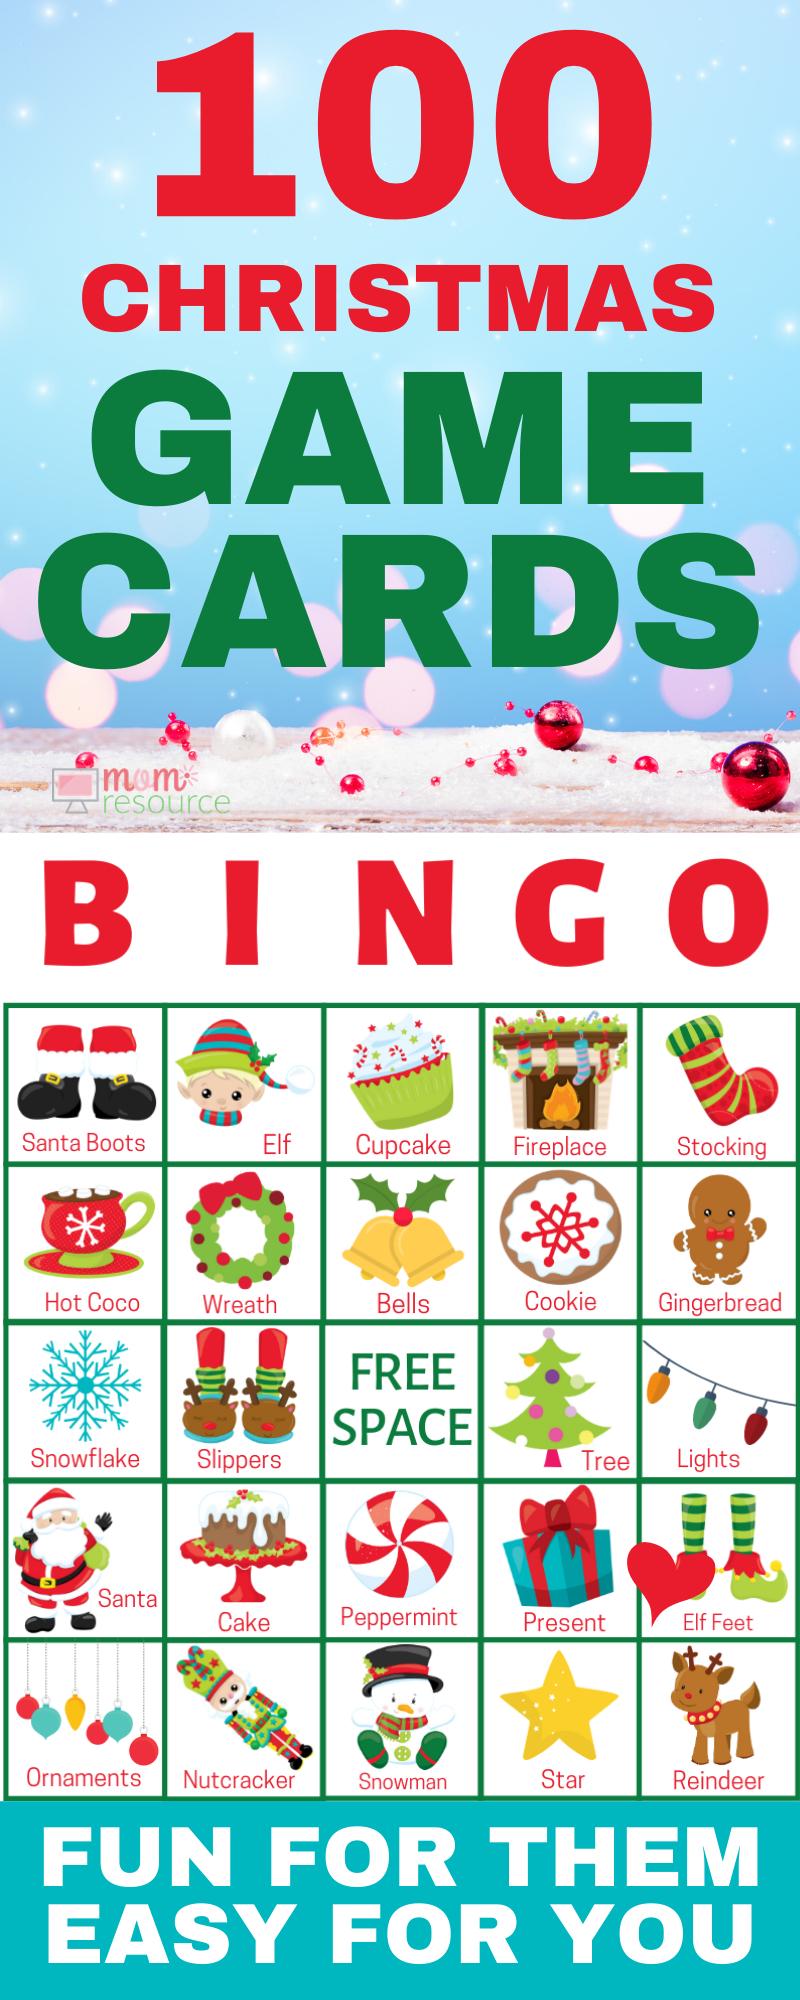 Christmas Printable Bingo Cards For Large Group (Up To 140